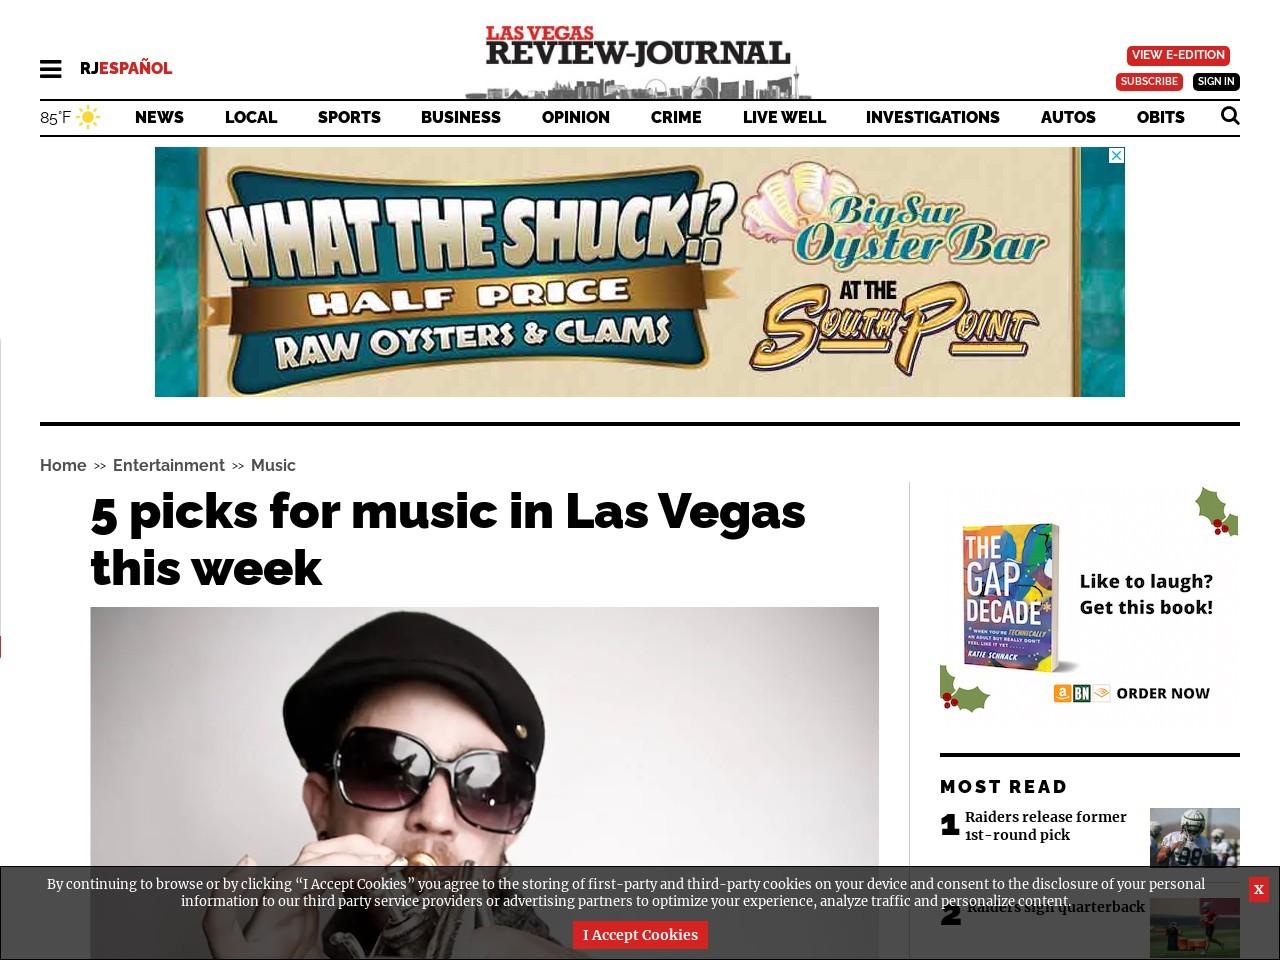 5 picks for music in Las Vegas this week